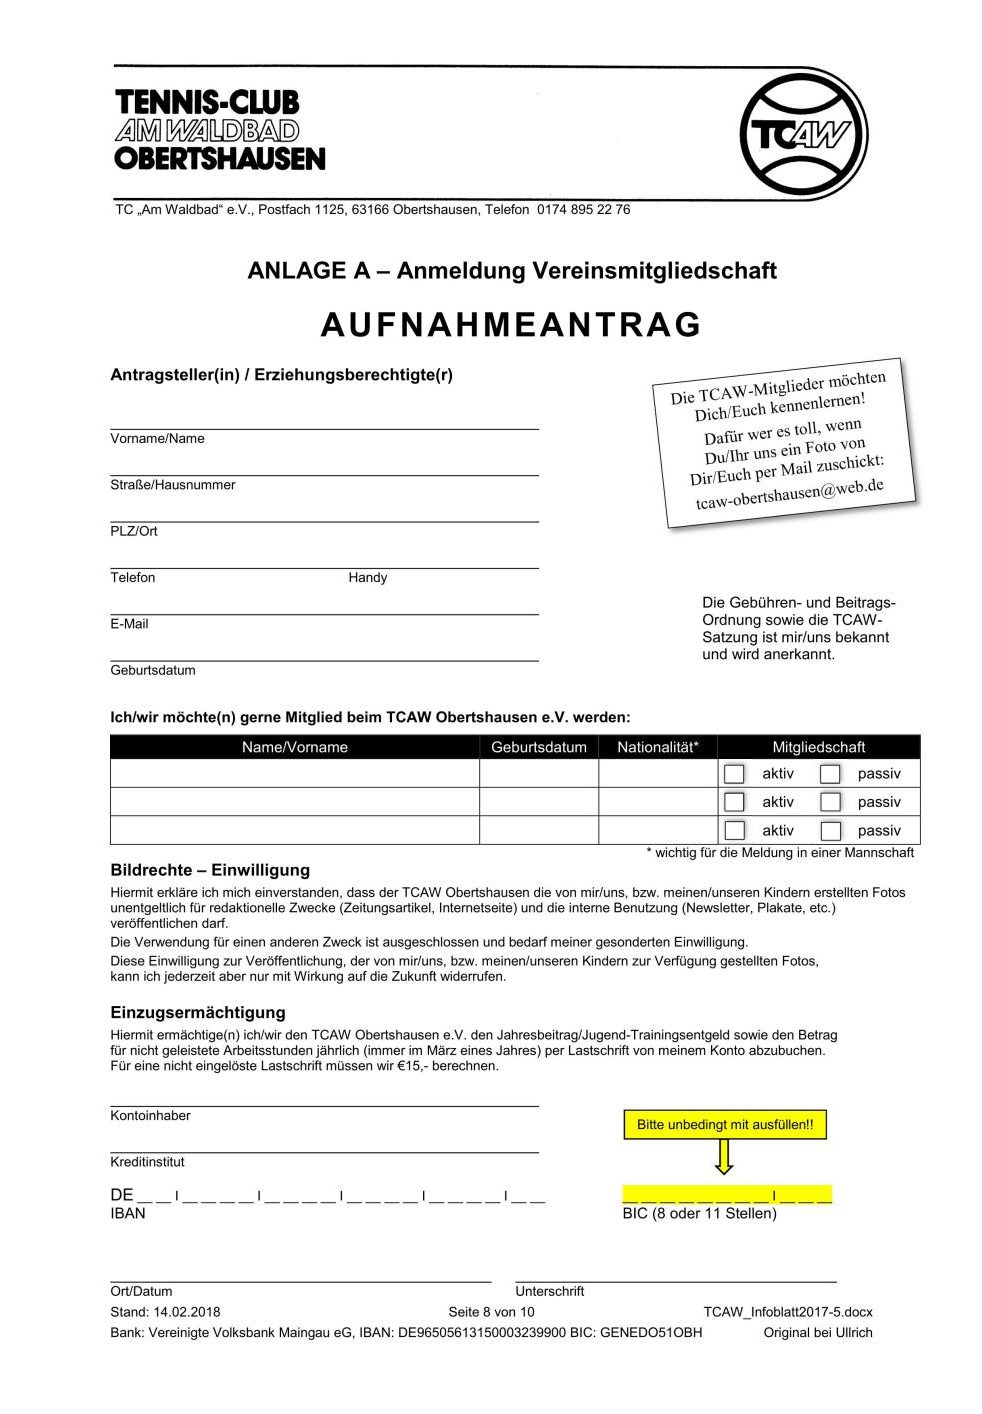 2017_Mitgliedsantrag-Training-Jugend_V2_01_1000x1414